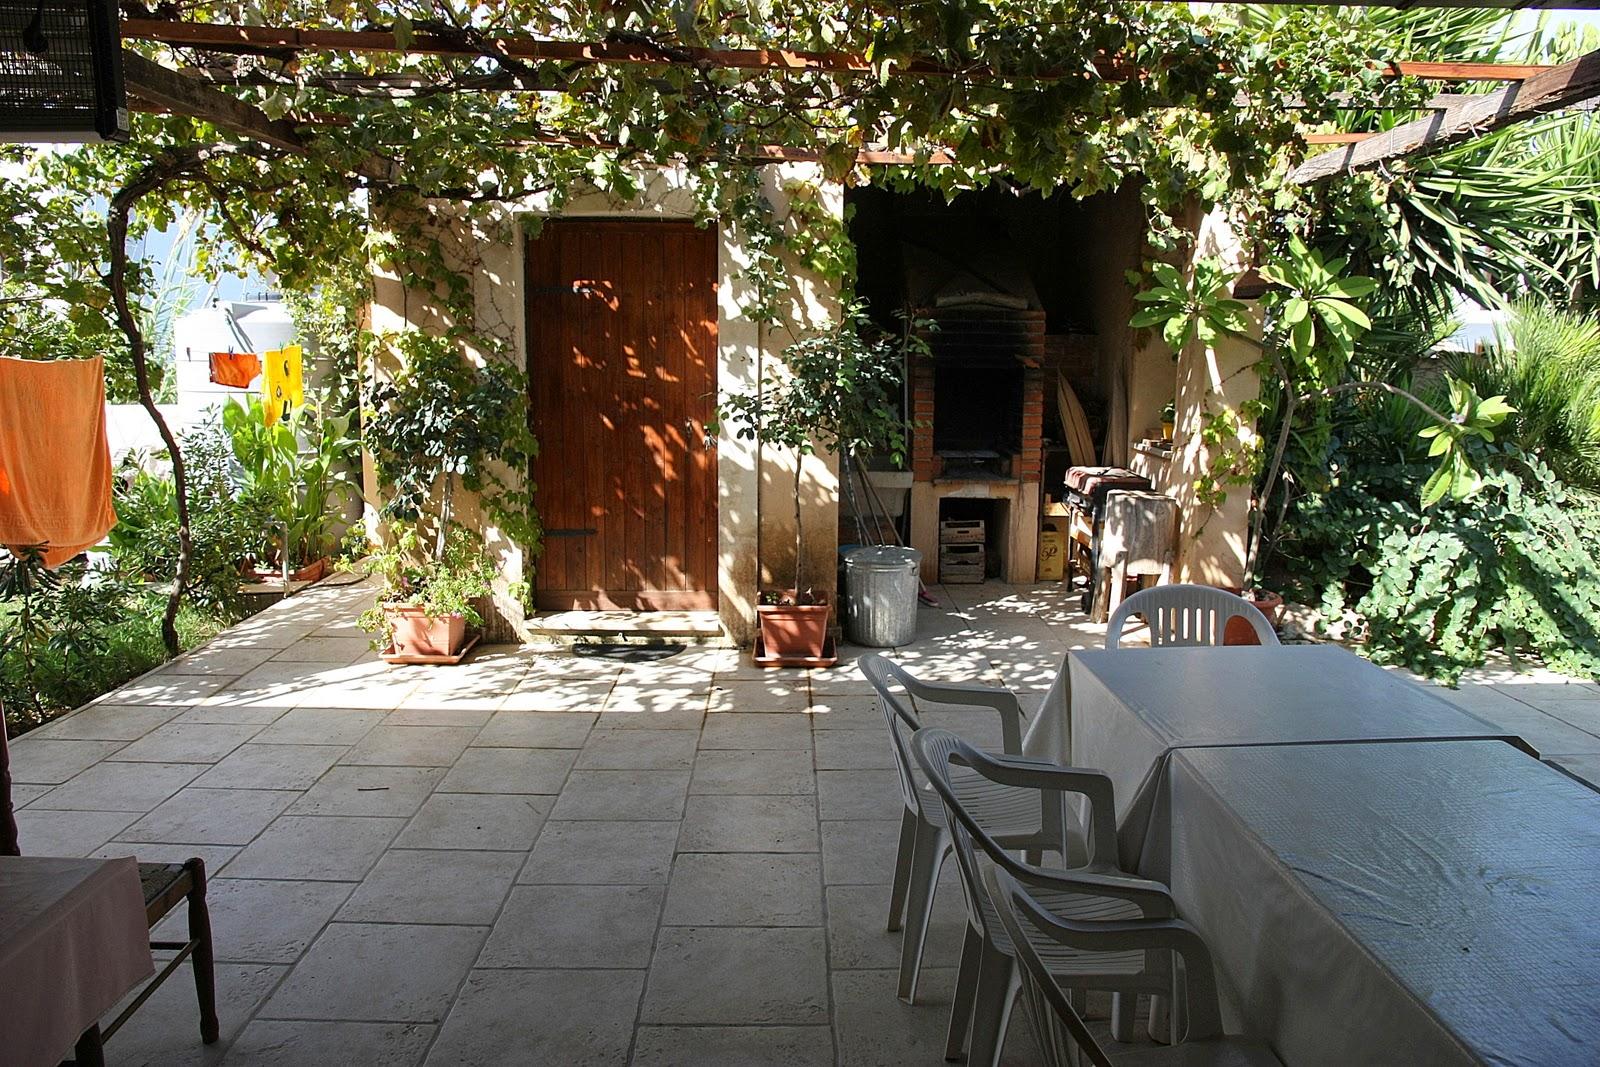 внутренняя терраса-дворик в тени фигового дерева с барбекью...